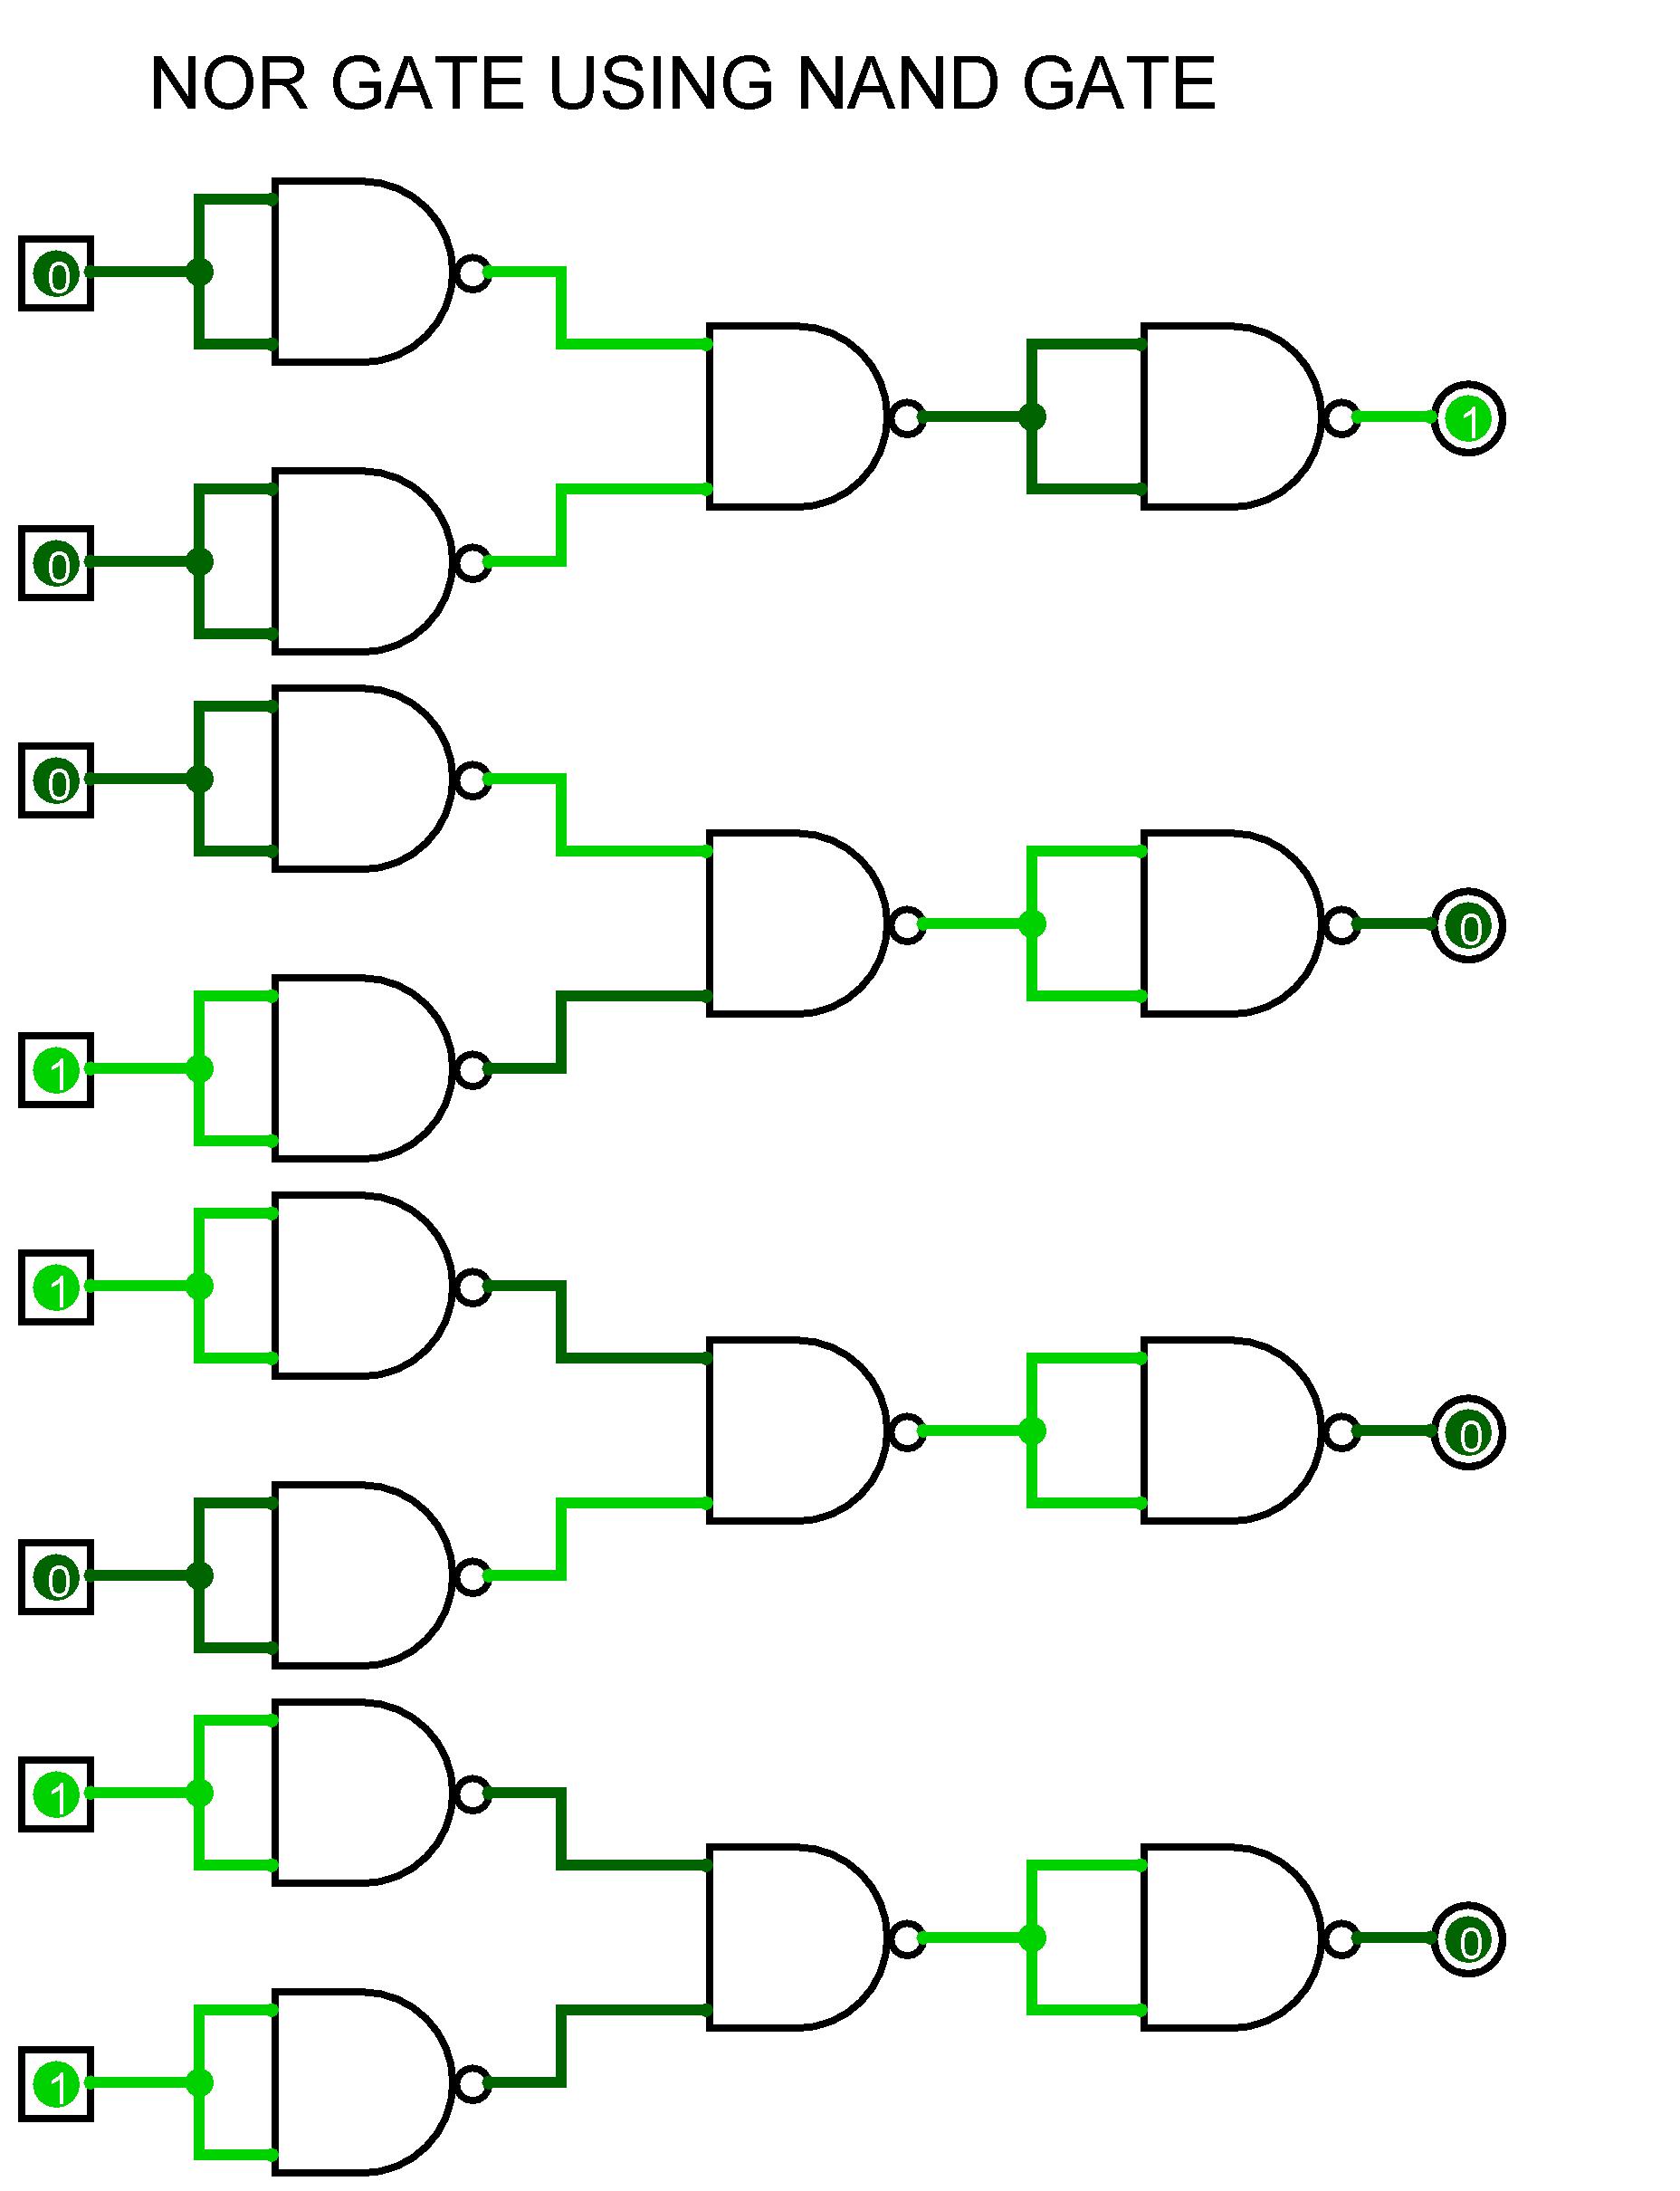 Nand Gate Logic Diagram Of